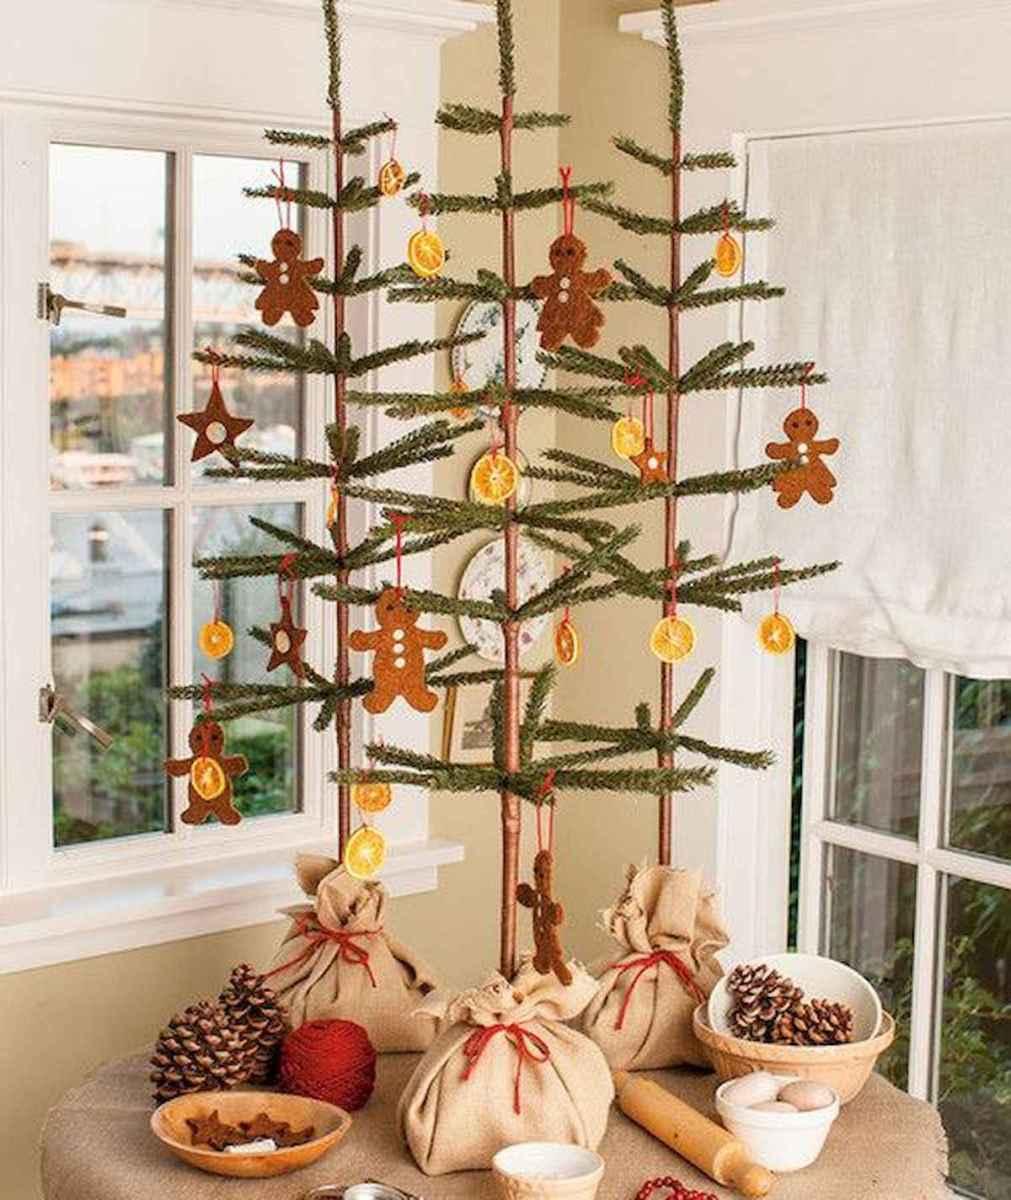 30 Rustic And Vintage Christmas Tree Decor Ideas (17)